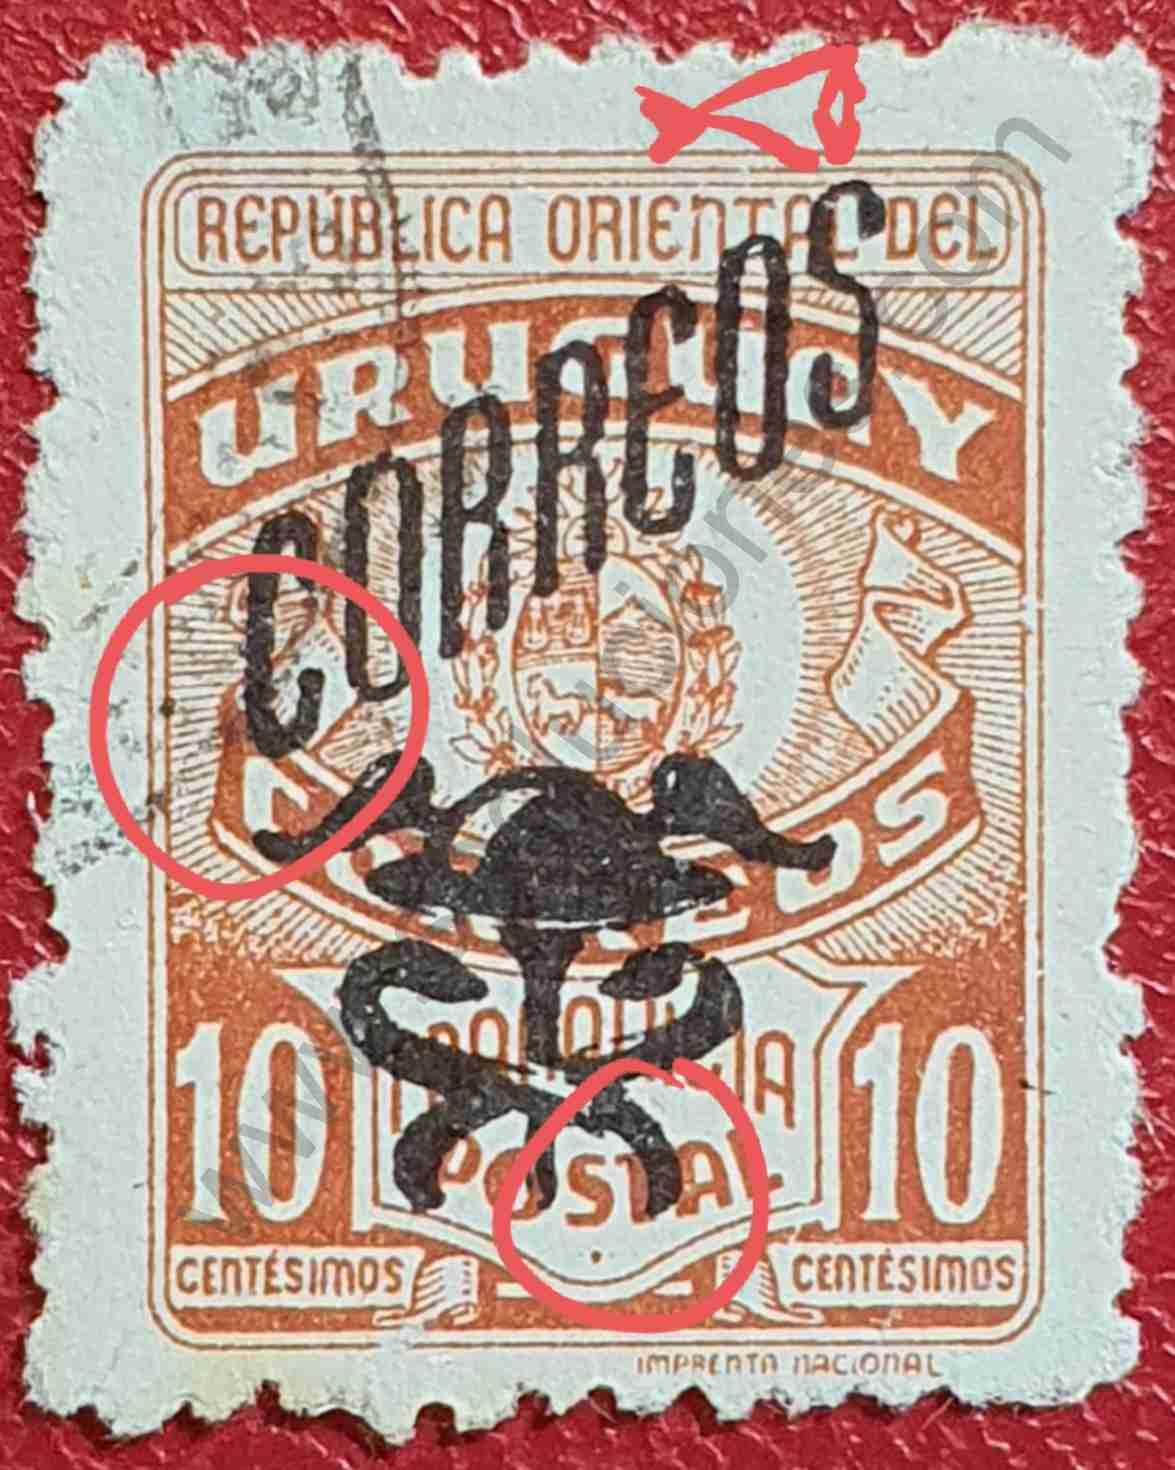 Sello con escudo y símbolo - Uruguay 1946